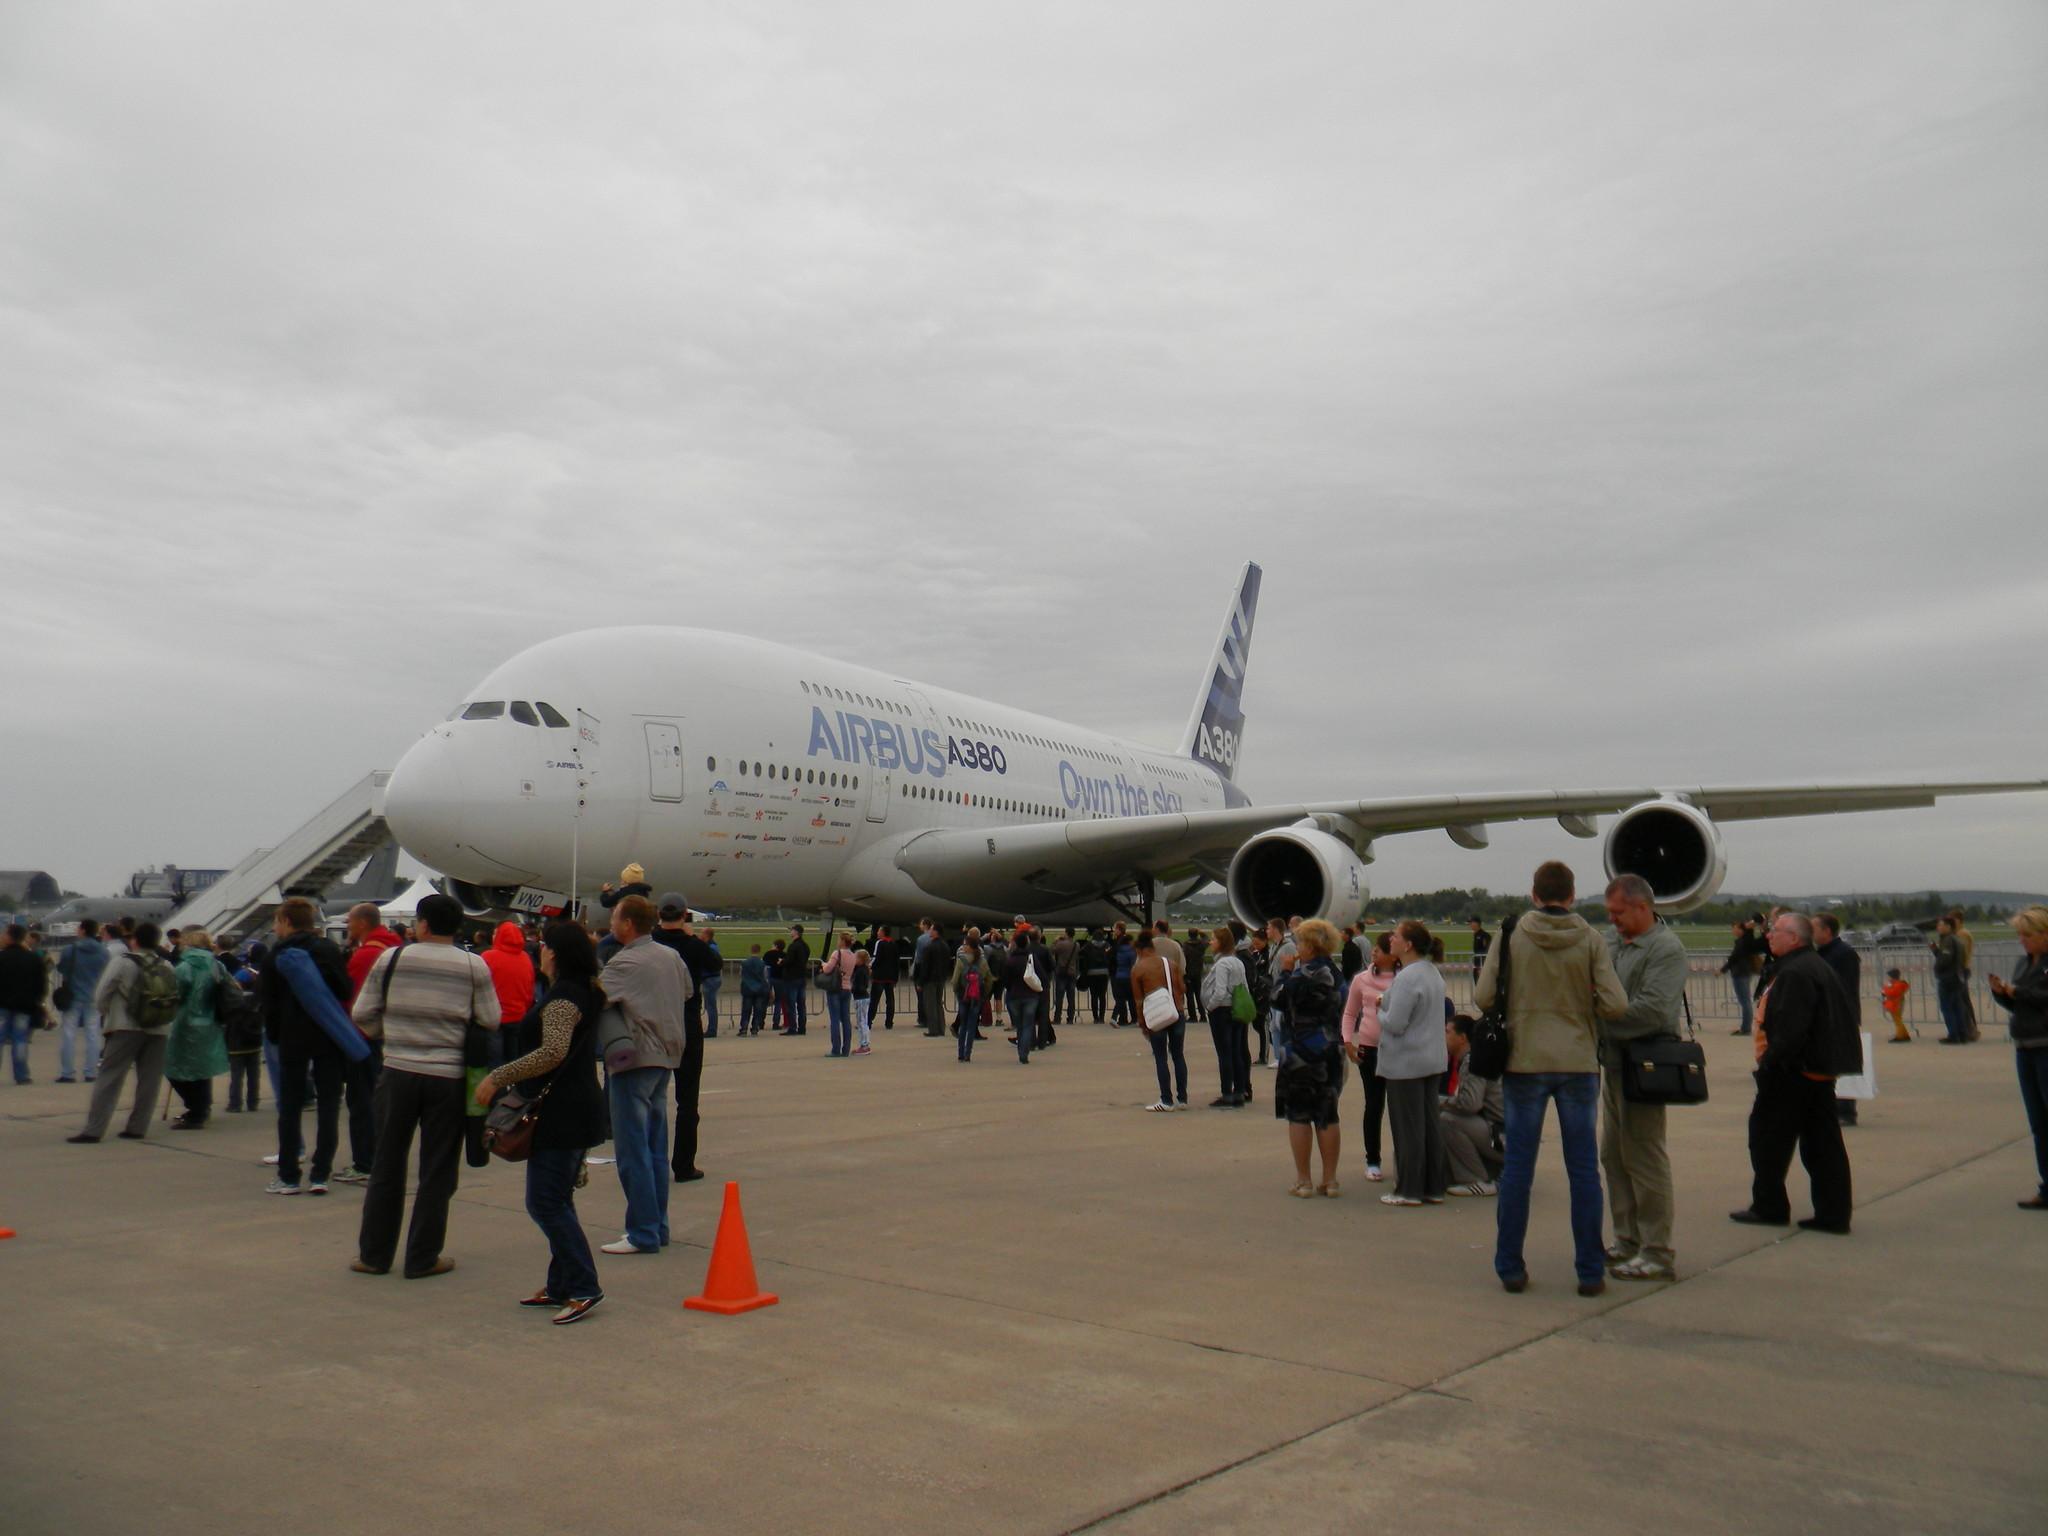 Лайнер-гигант Airbus A-380 (Эрбас А-380) производства европейского авиастроительного концерна EADS